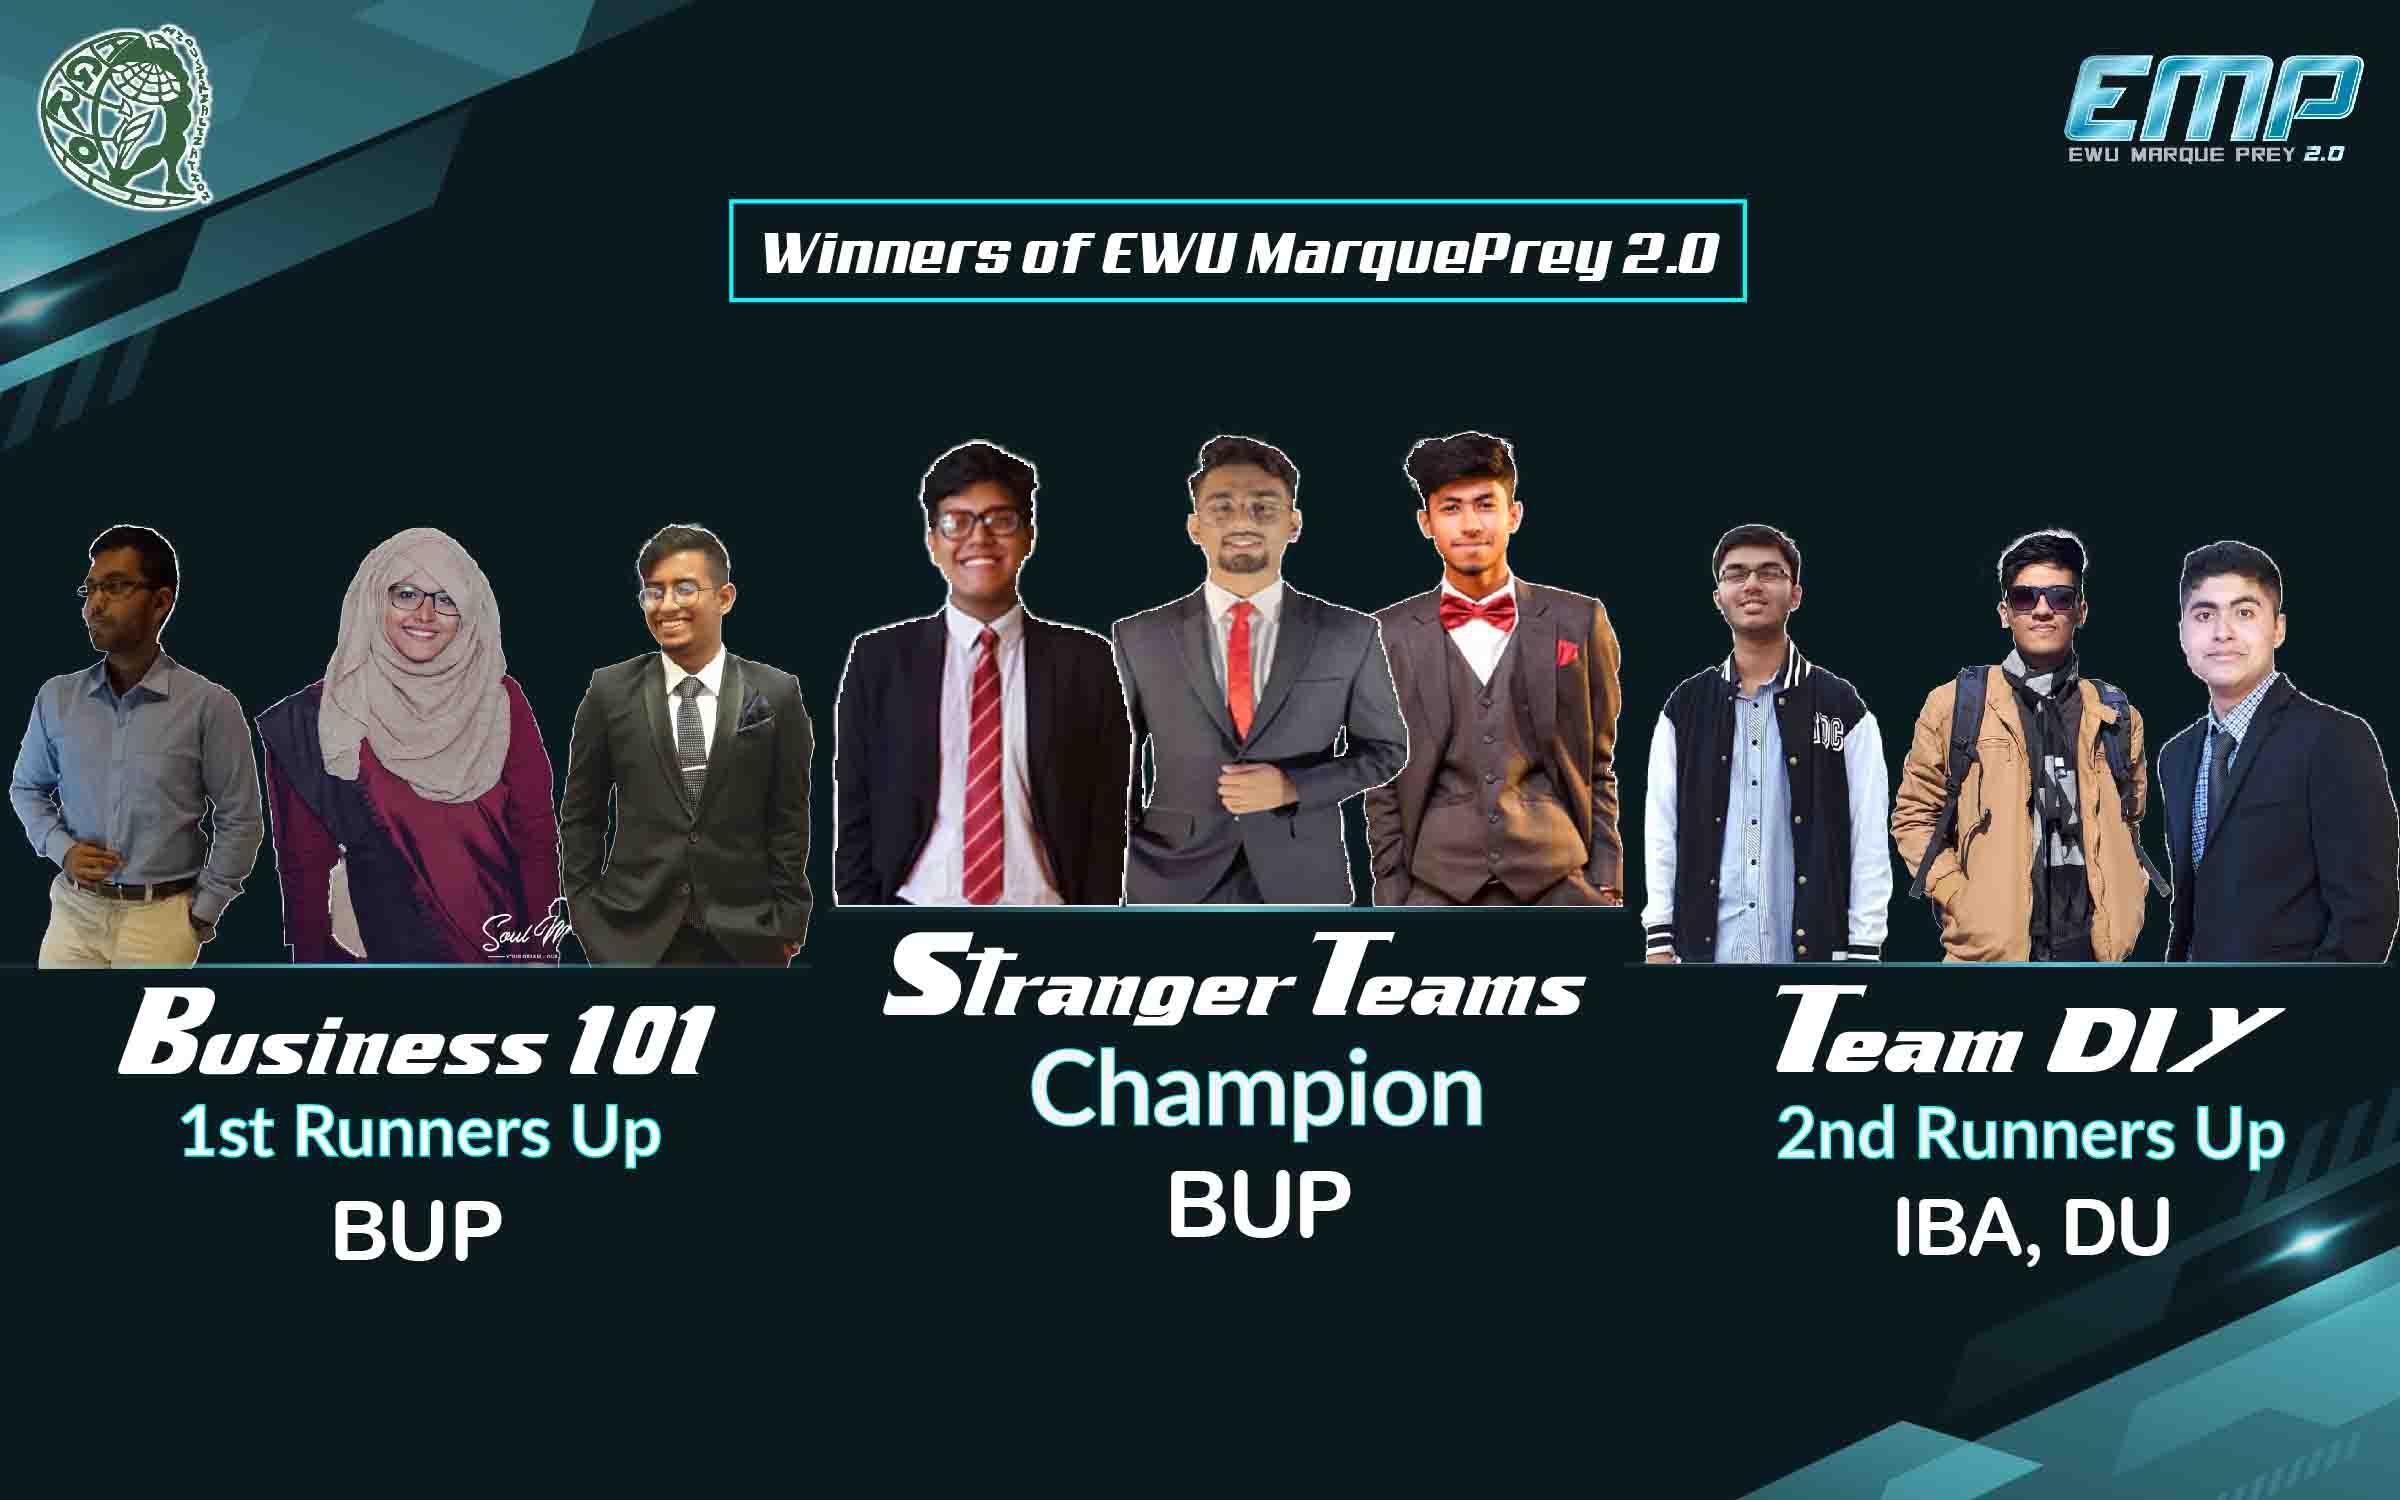 EWU MarquePrey 2.0 an Agro Branding Competition